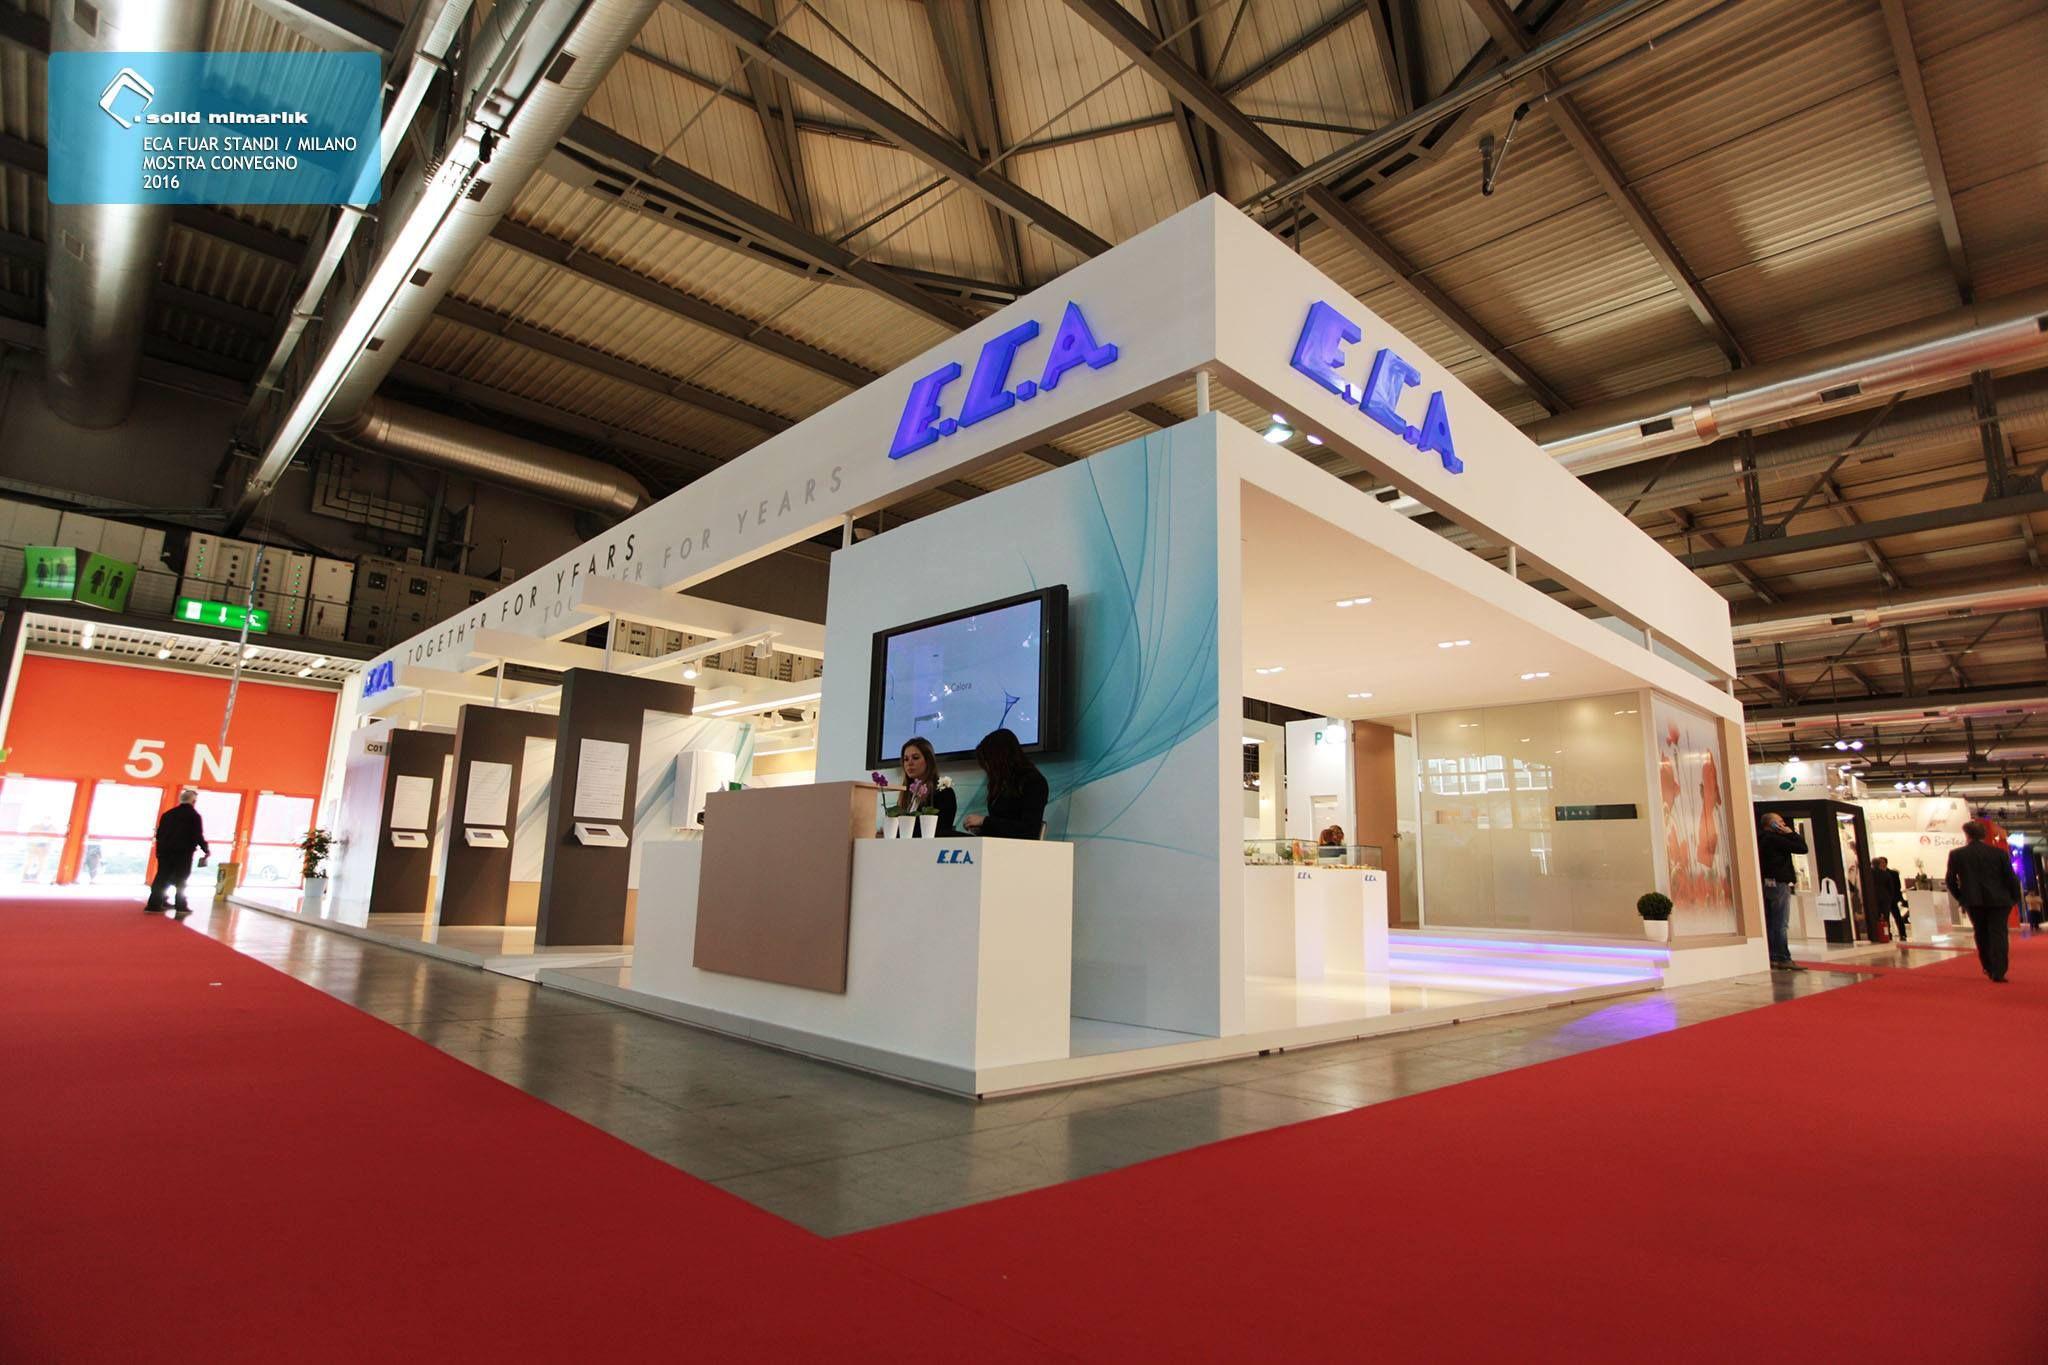 ... International Exhibition Company, Fair Design, Design, Exhibition, Fair,  Stand, Office Decoration, Home Decoration, Ofis Dekorasyonu, Mağaza  Dekorasyonu ...